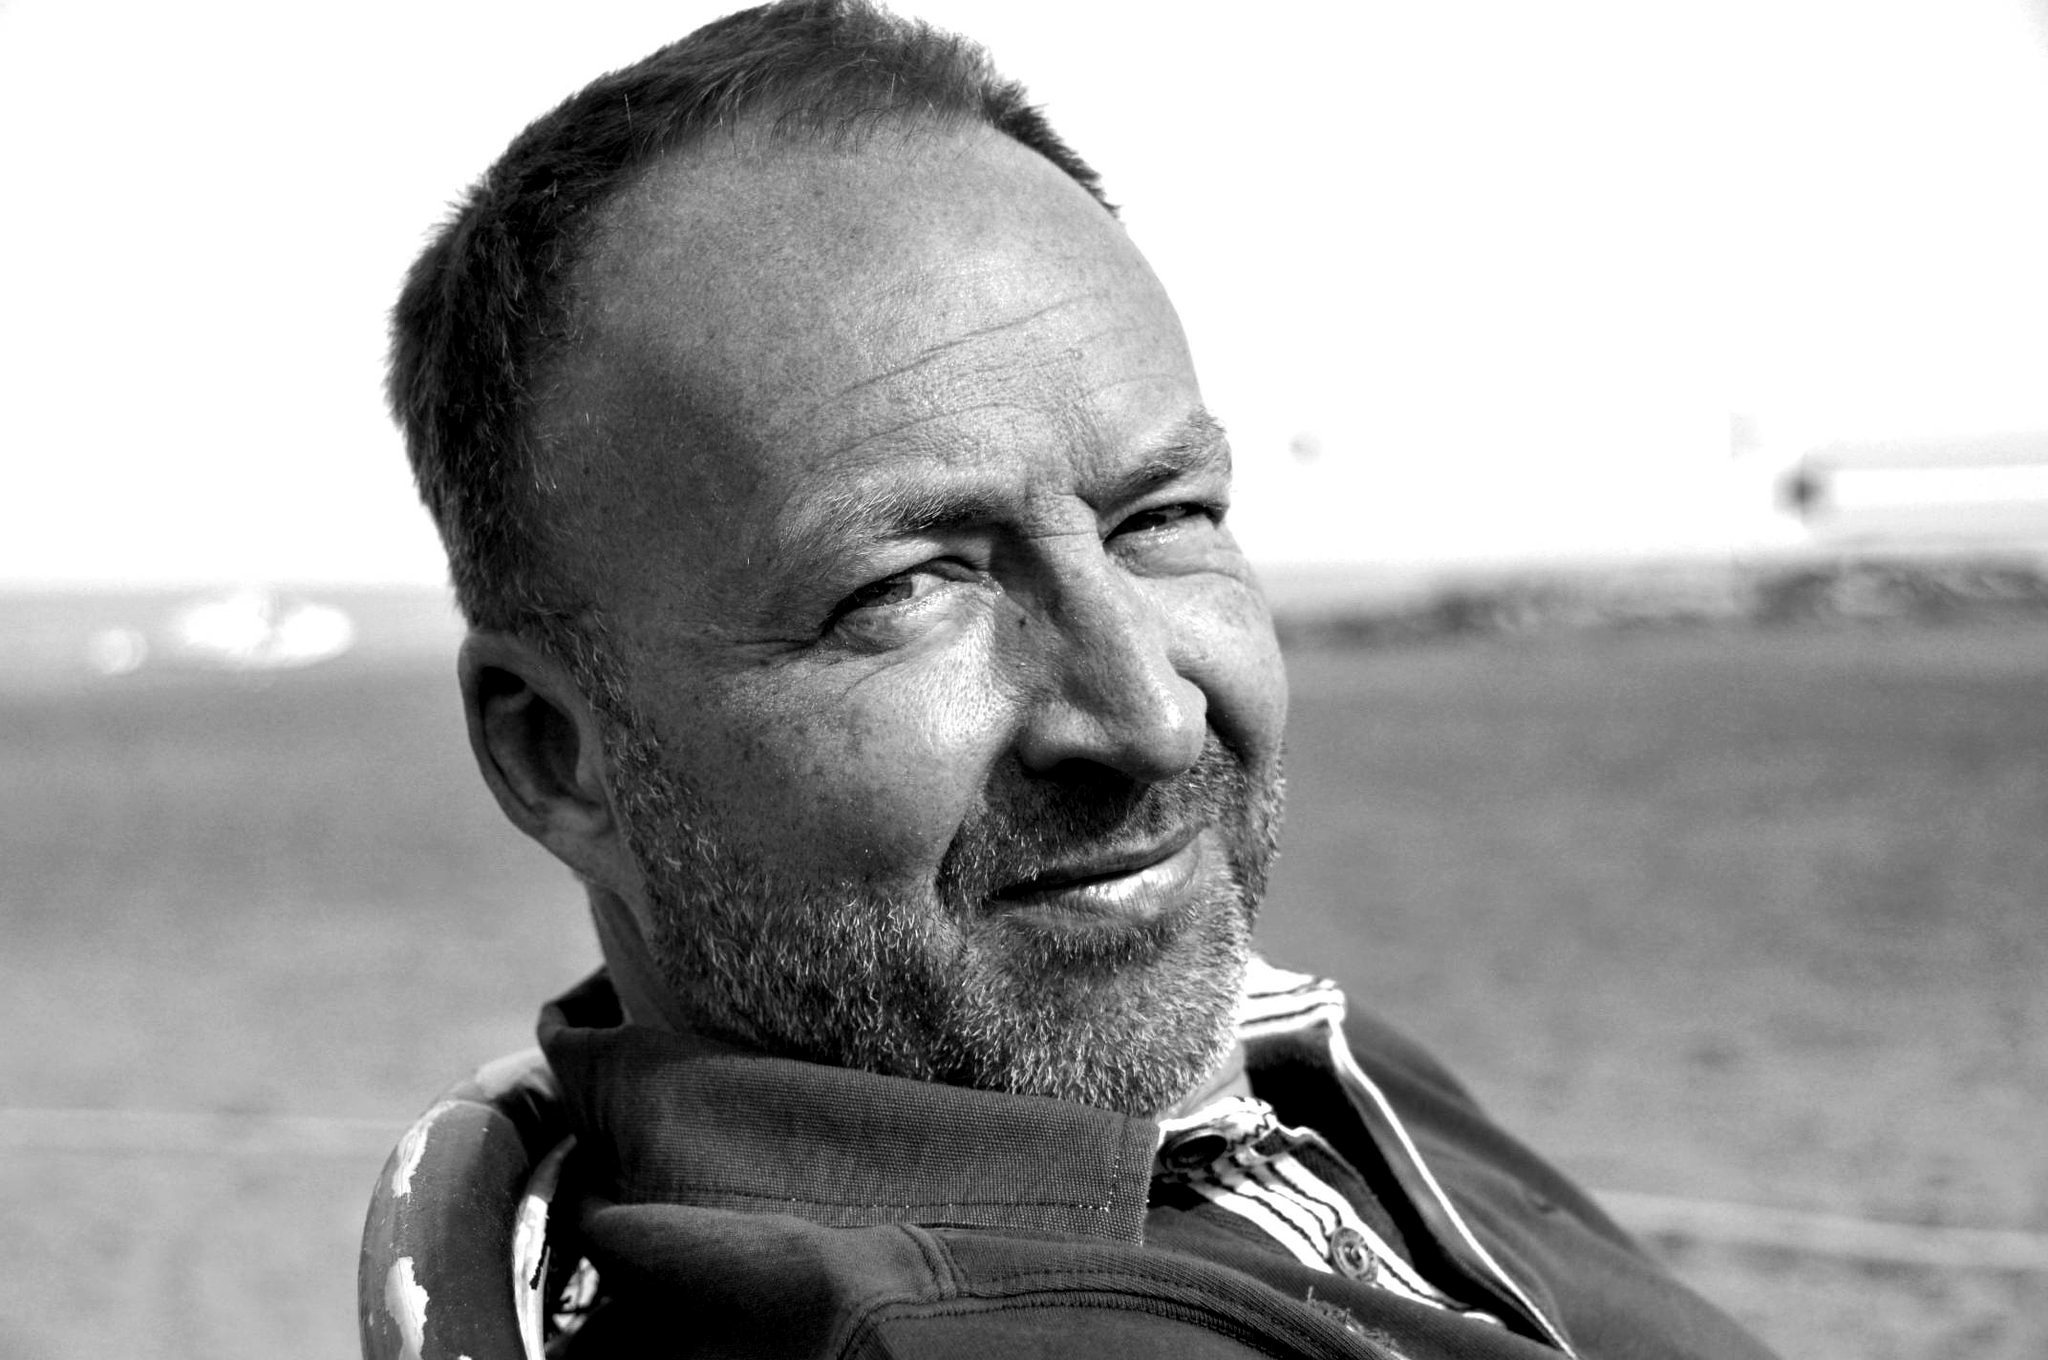 Björn Munkeby